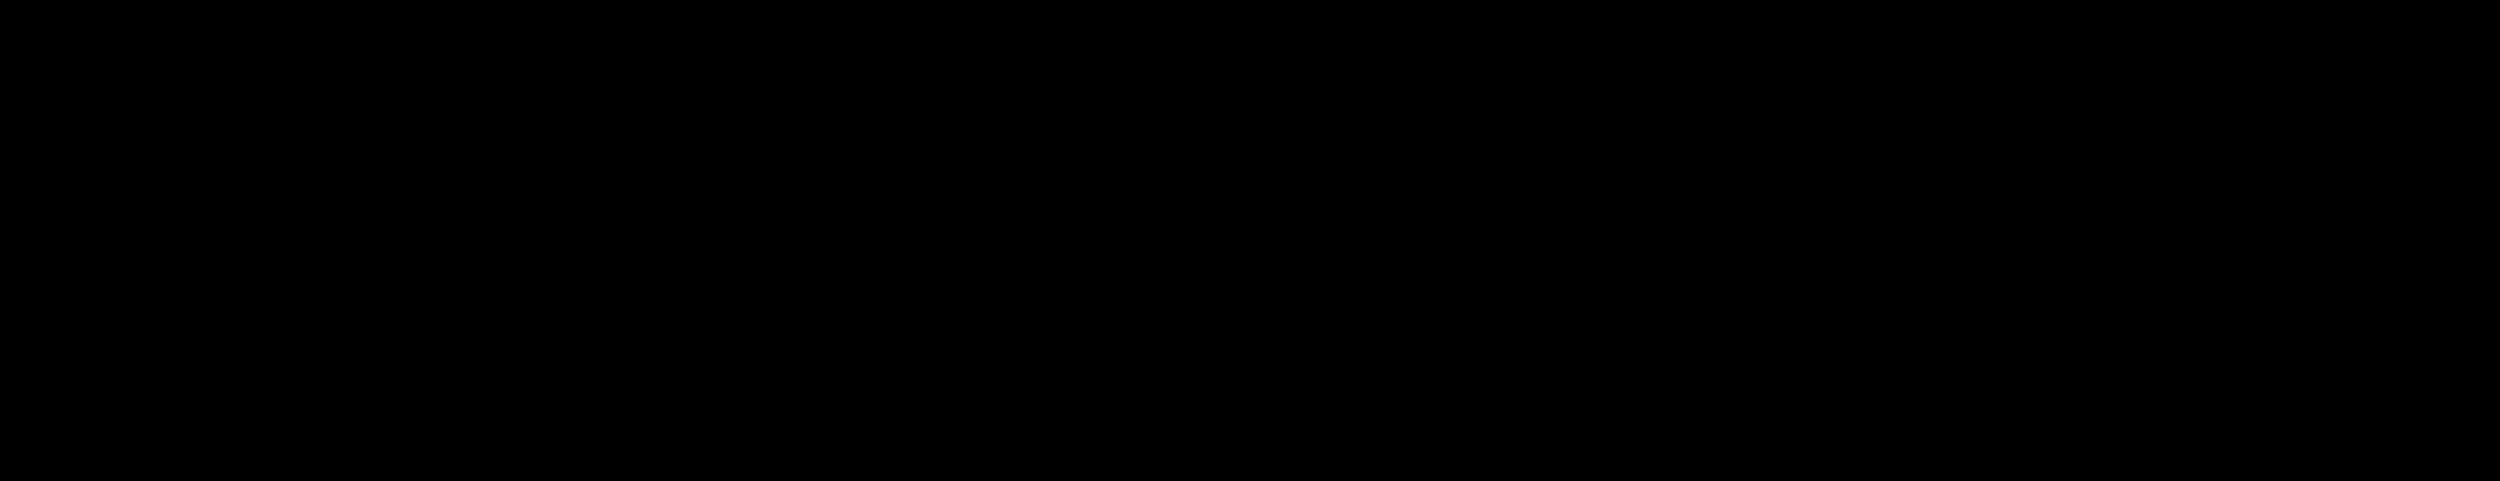 econogy-logo.png